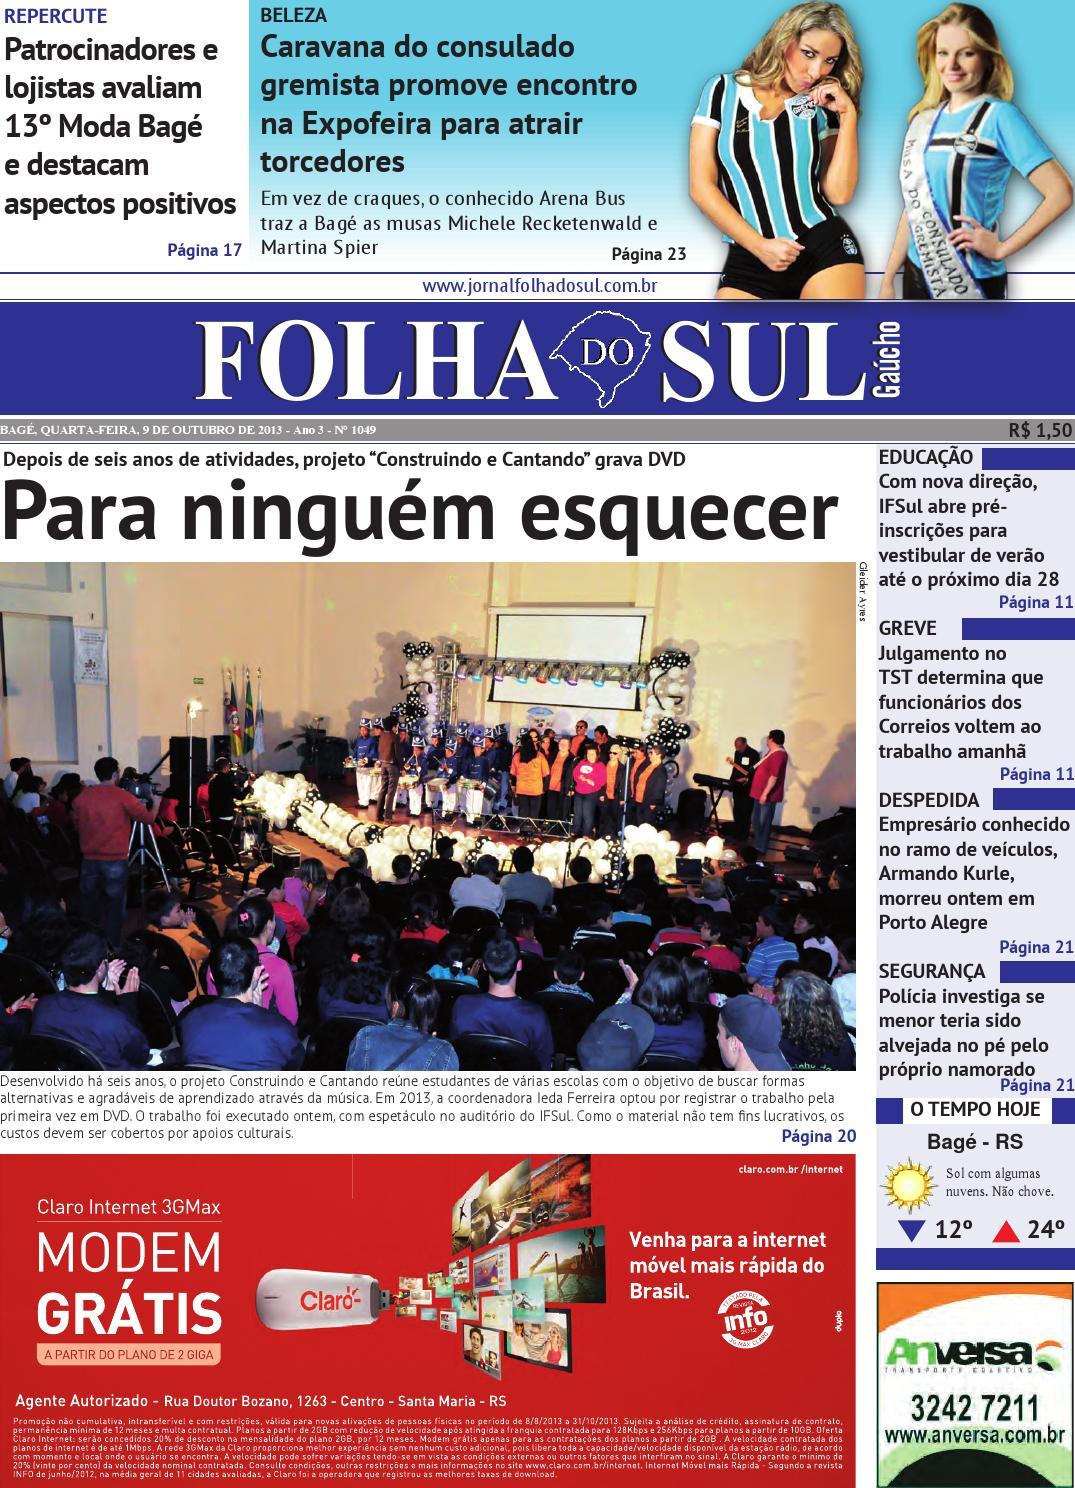 Folha do Sul Gaúcho Ed. 1049 (09 10 2013) by Folha do Sul Gaúcho - issuu ea3bf9cdff749